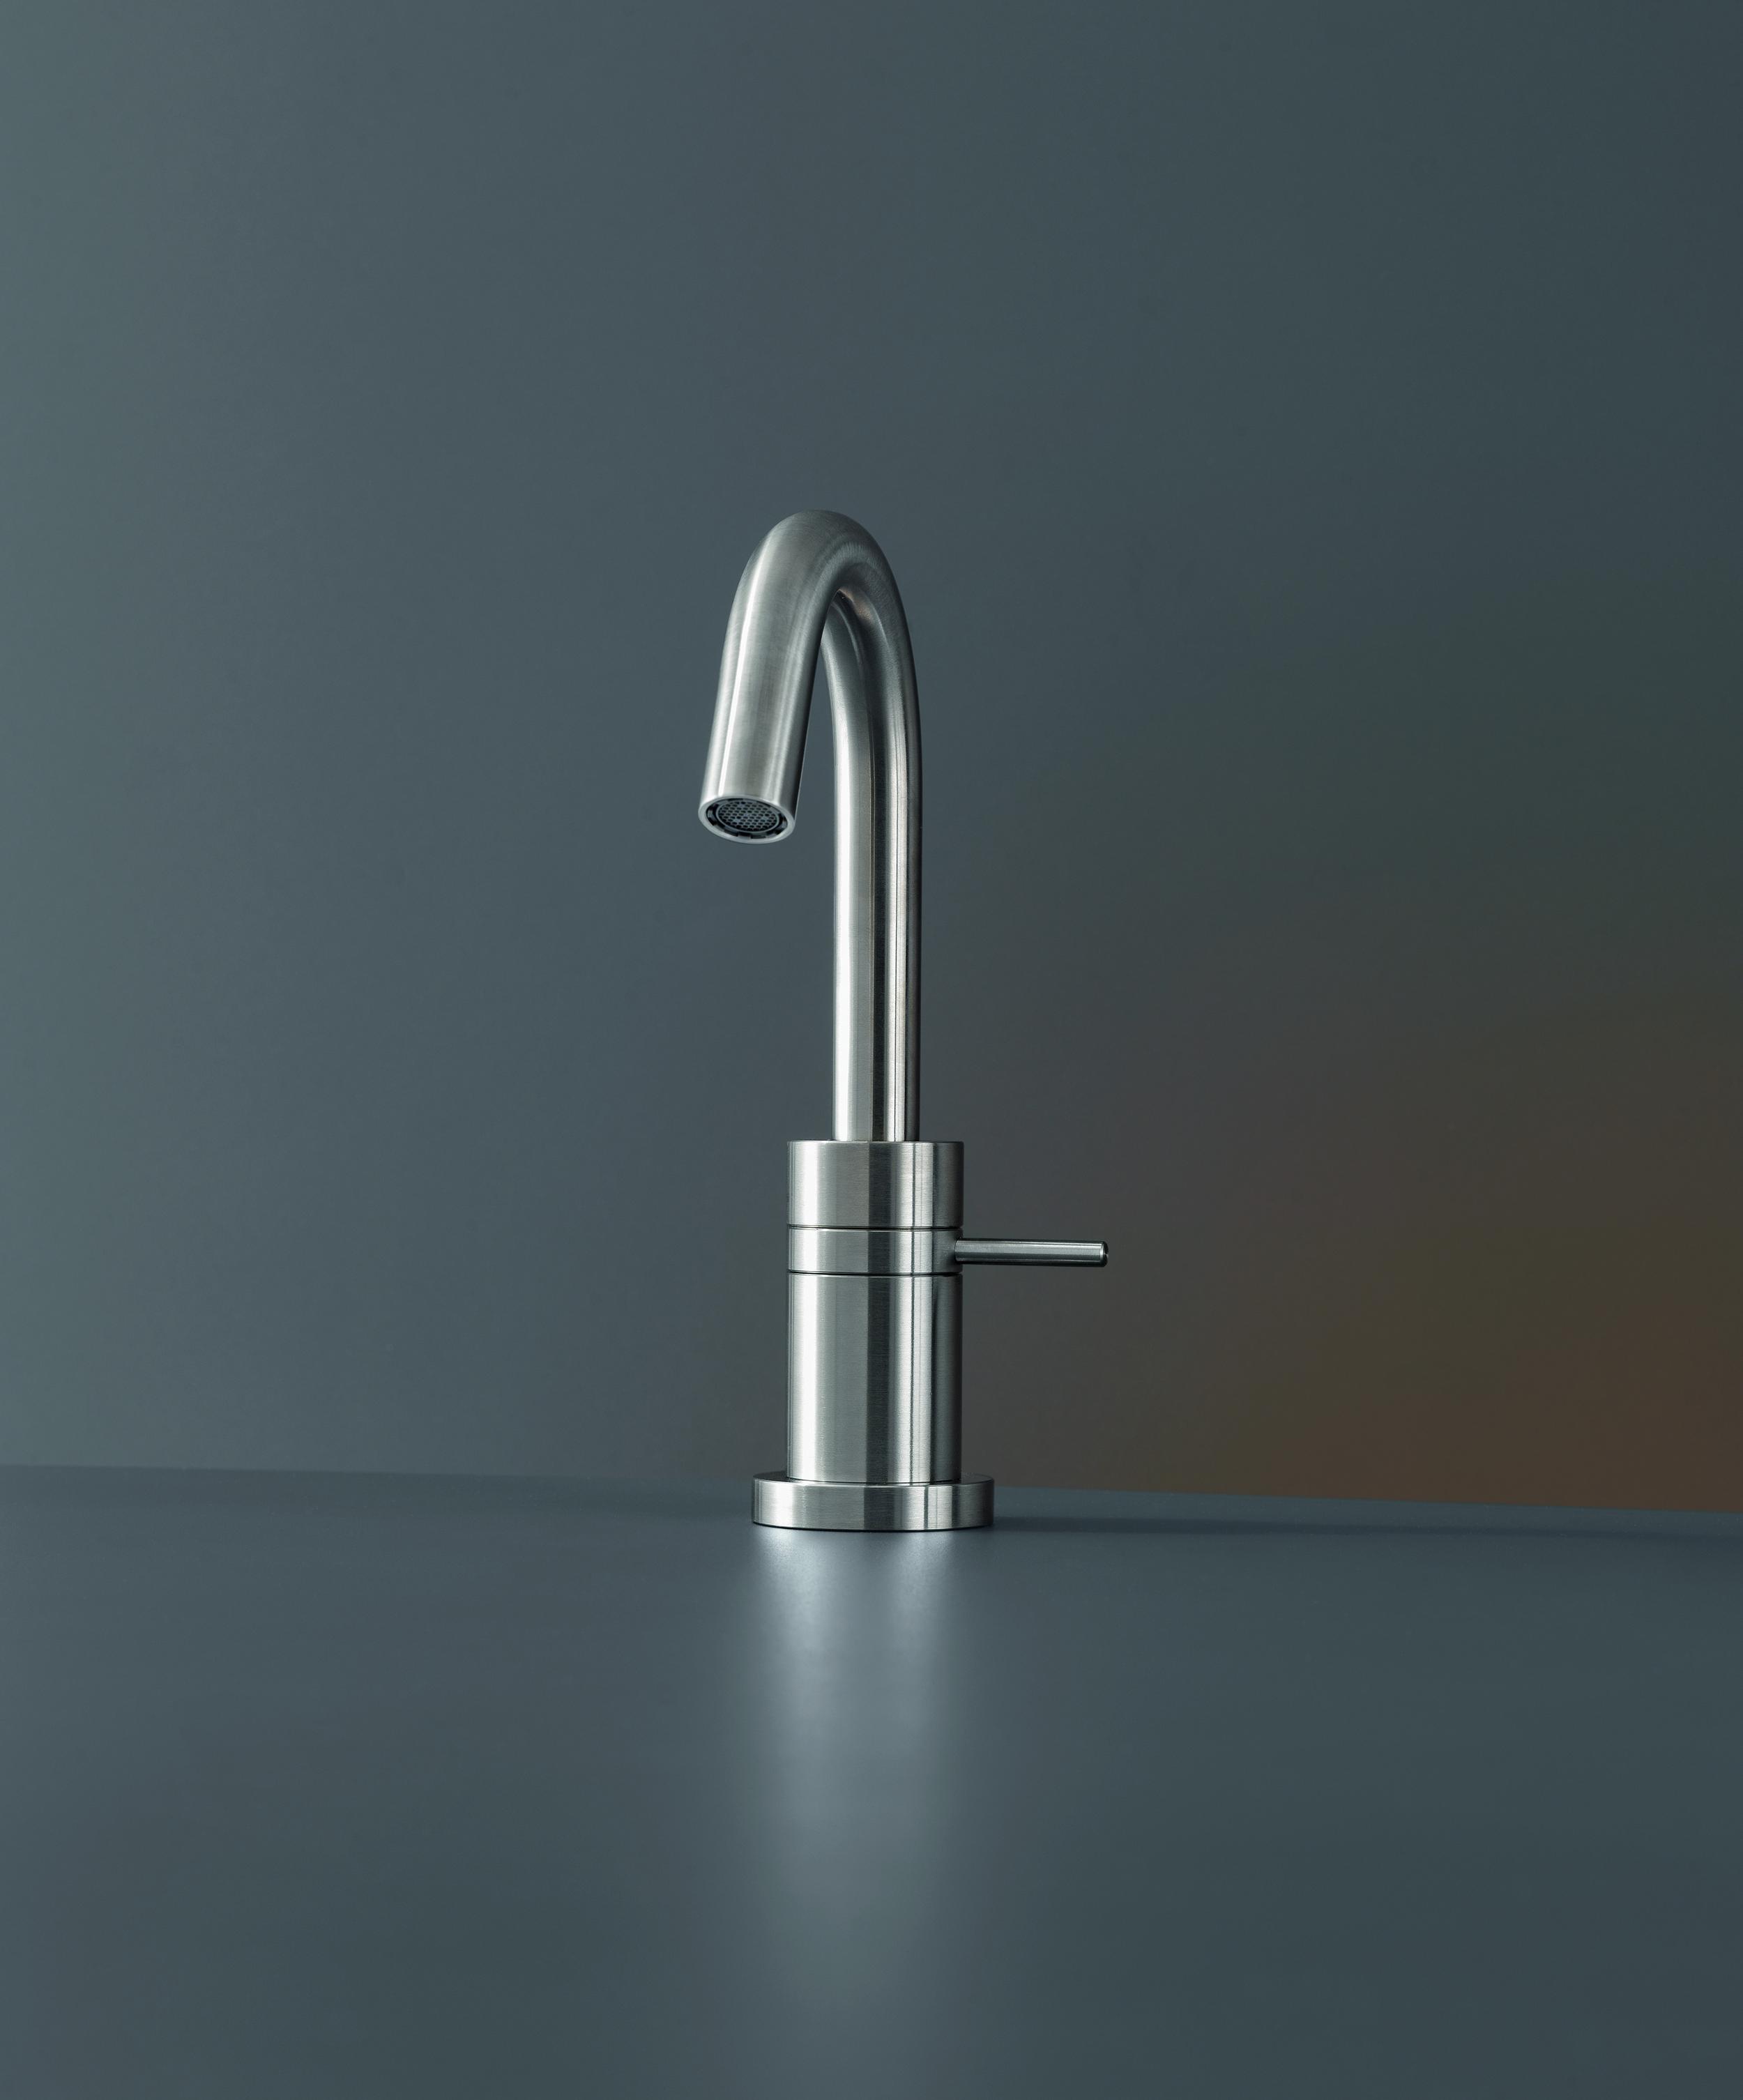 Contemporary Gradi Deck Mount Faucet